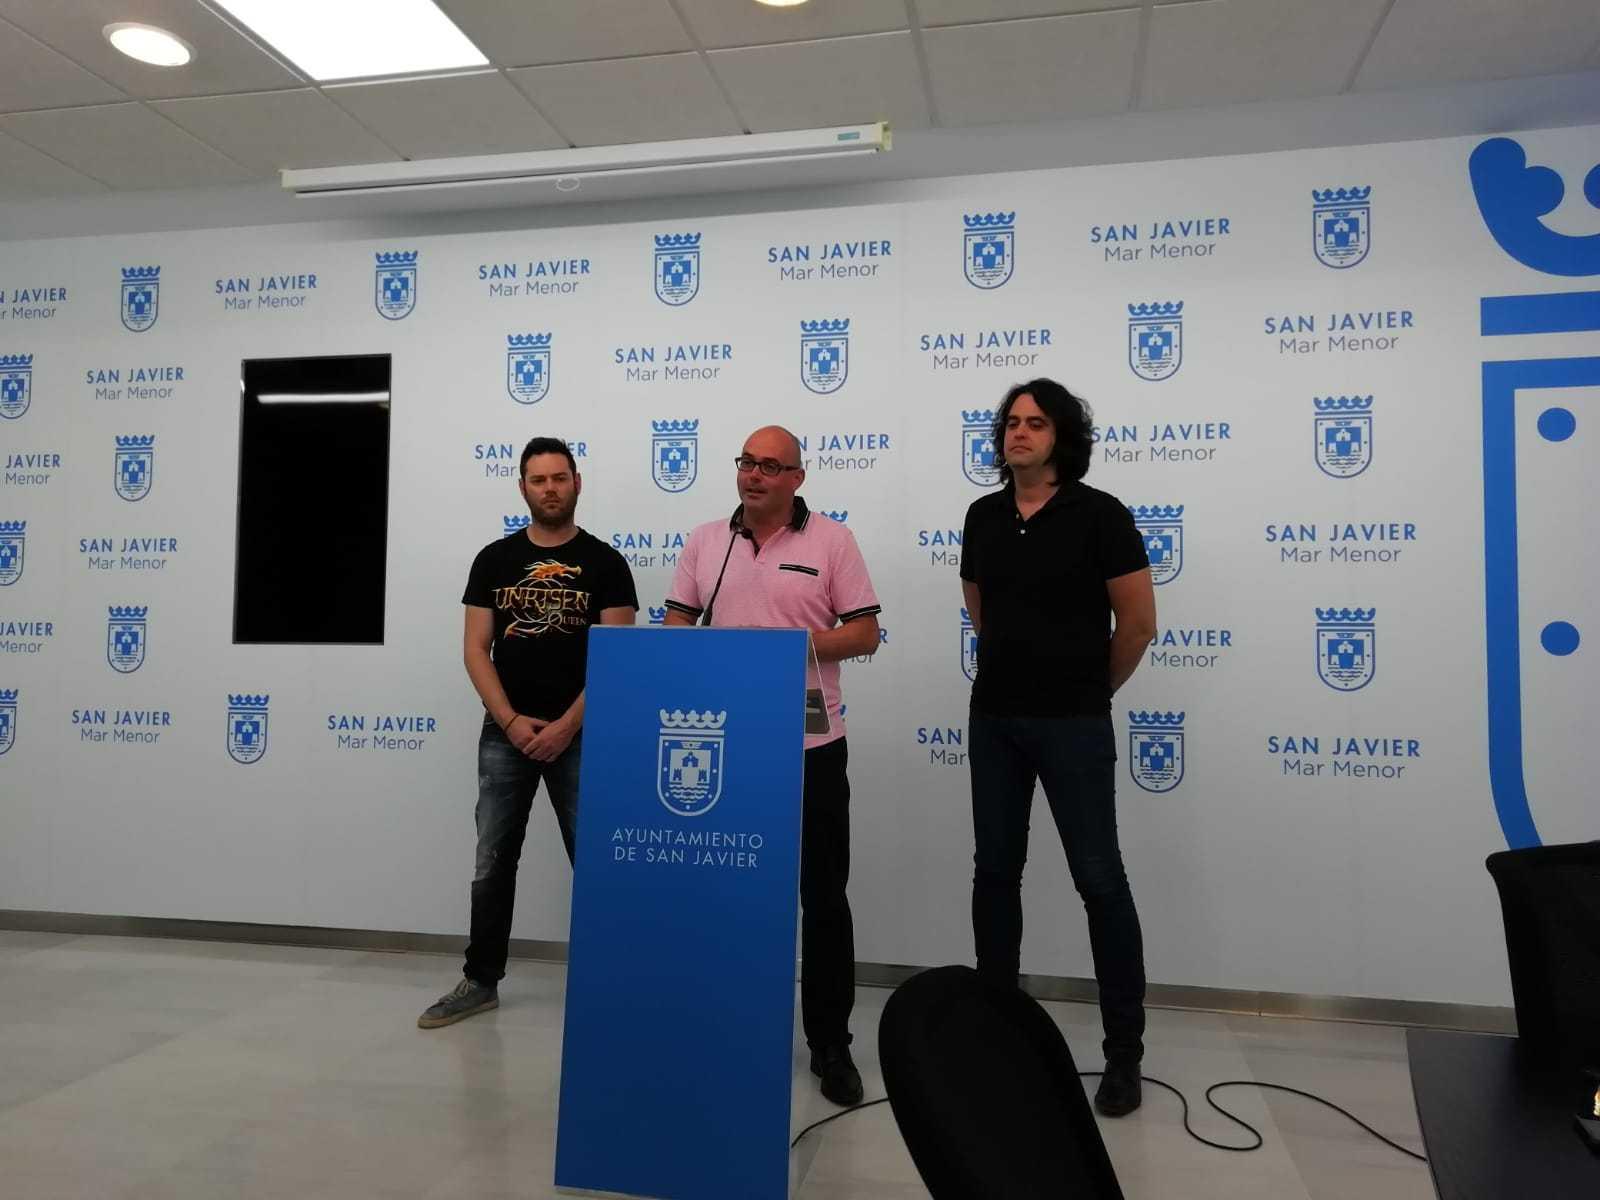 Press Conference in San Javier